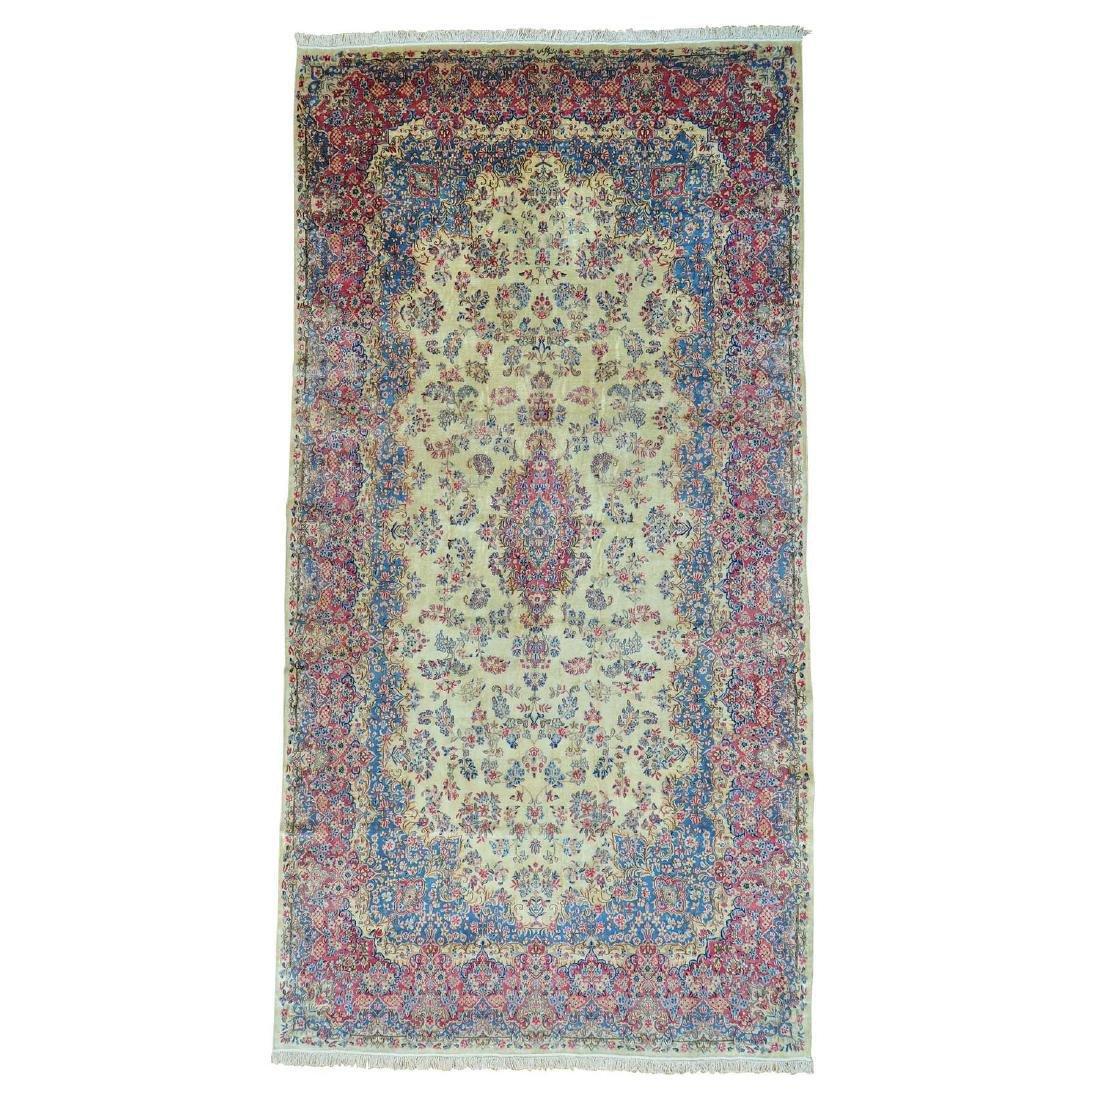 Antique Persian Kerman Gallery Good Rug 9.7x18.5